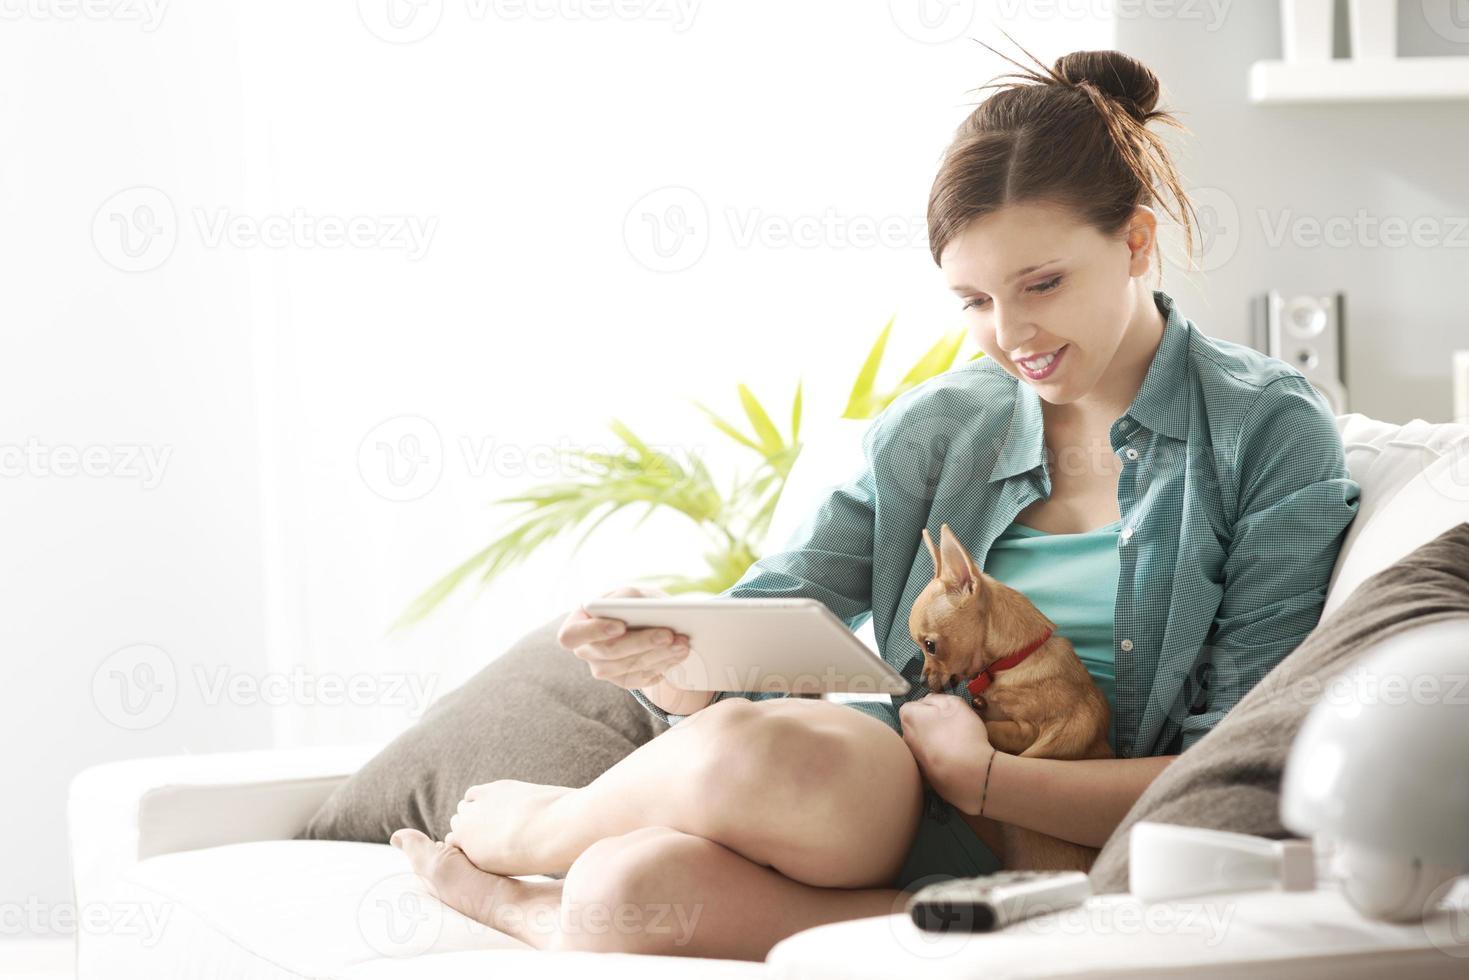 menina com tablet no sofá foto